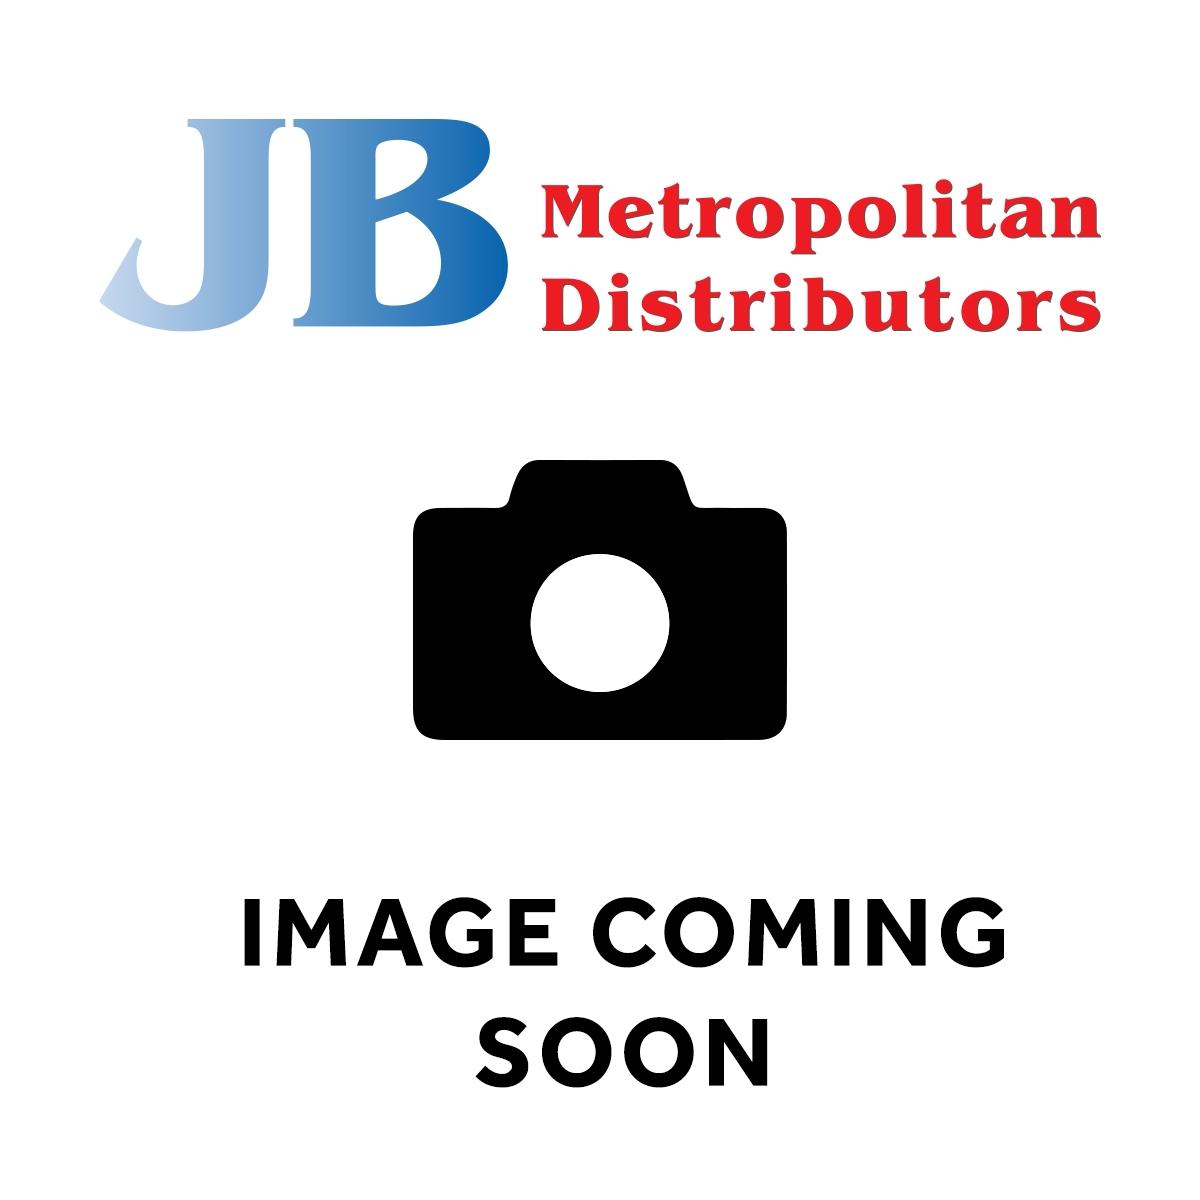 140G PASCALL CHOC MALLOWS BITES RASPBERRY